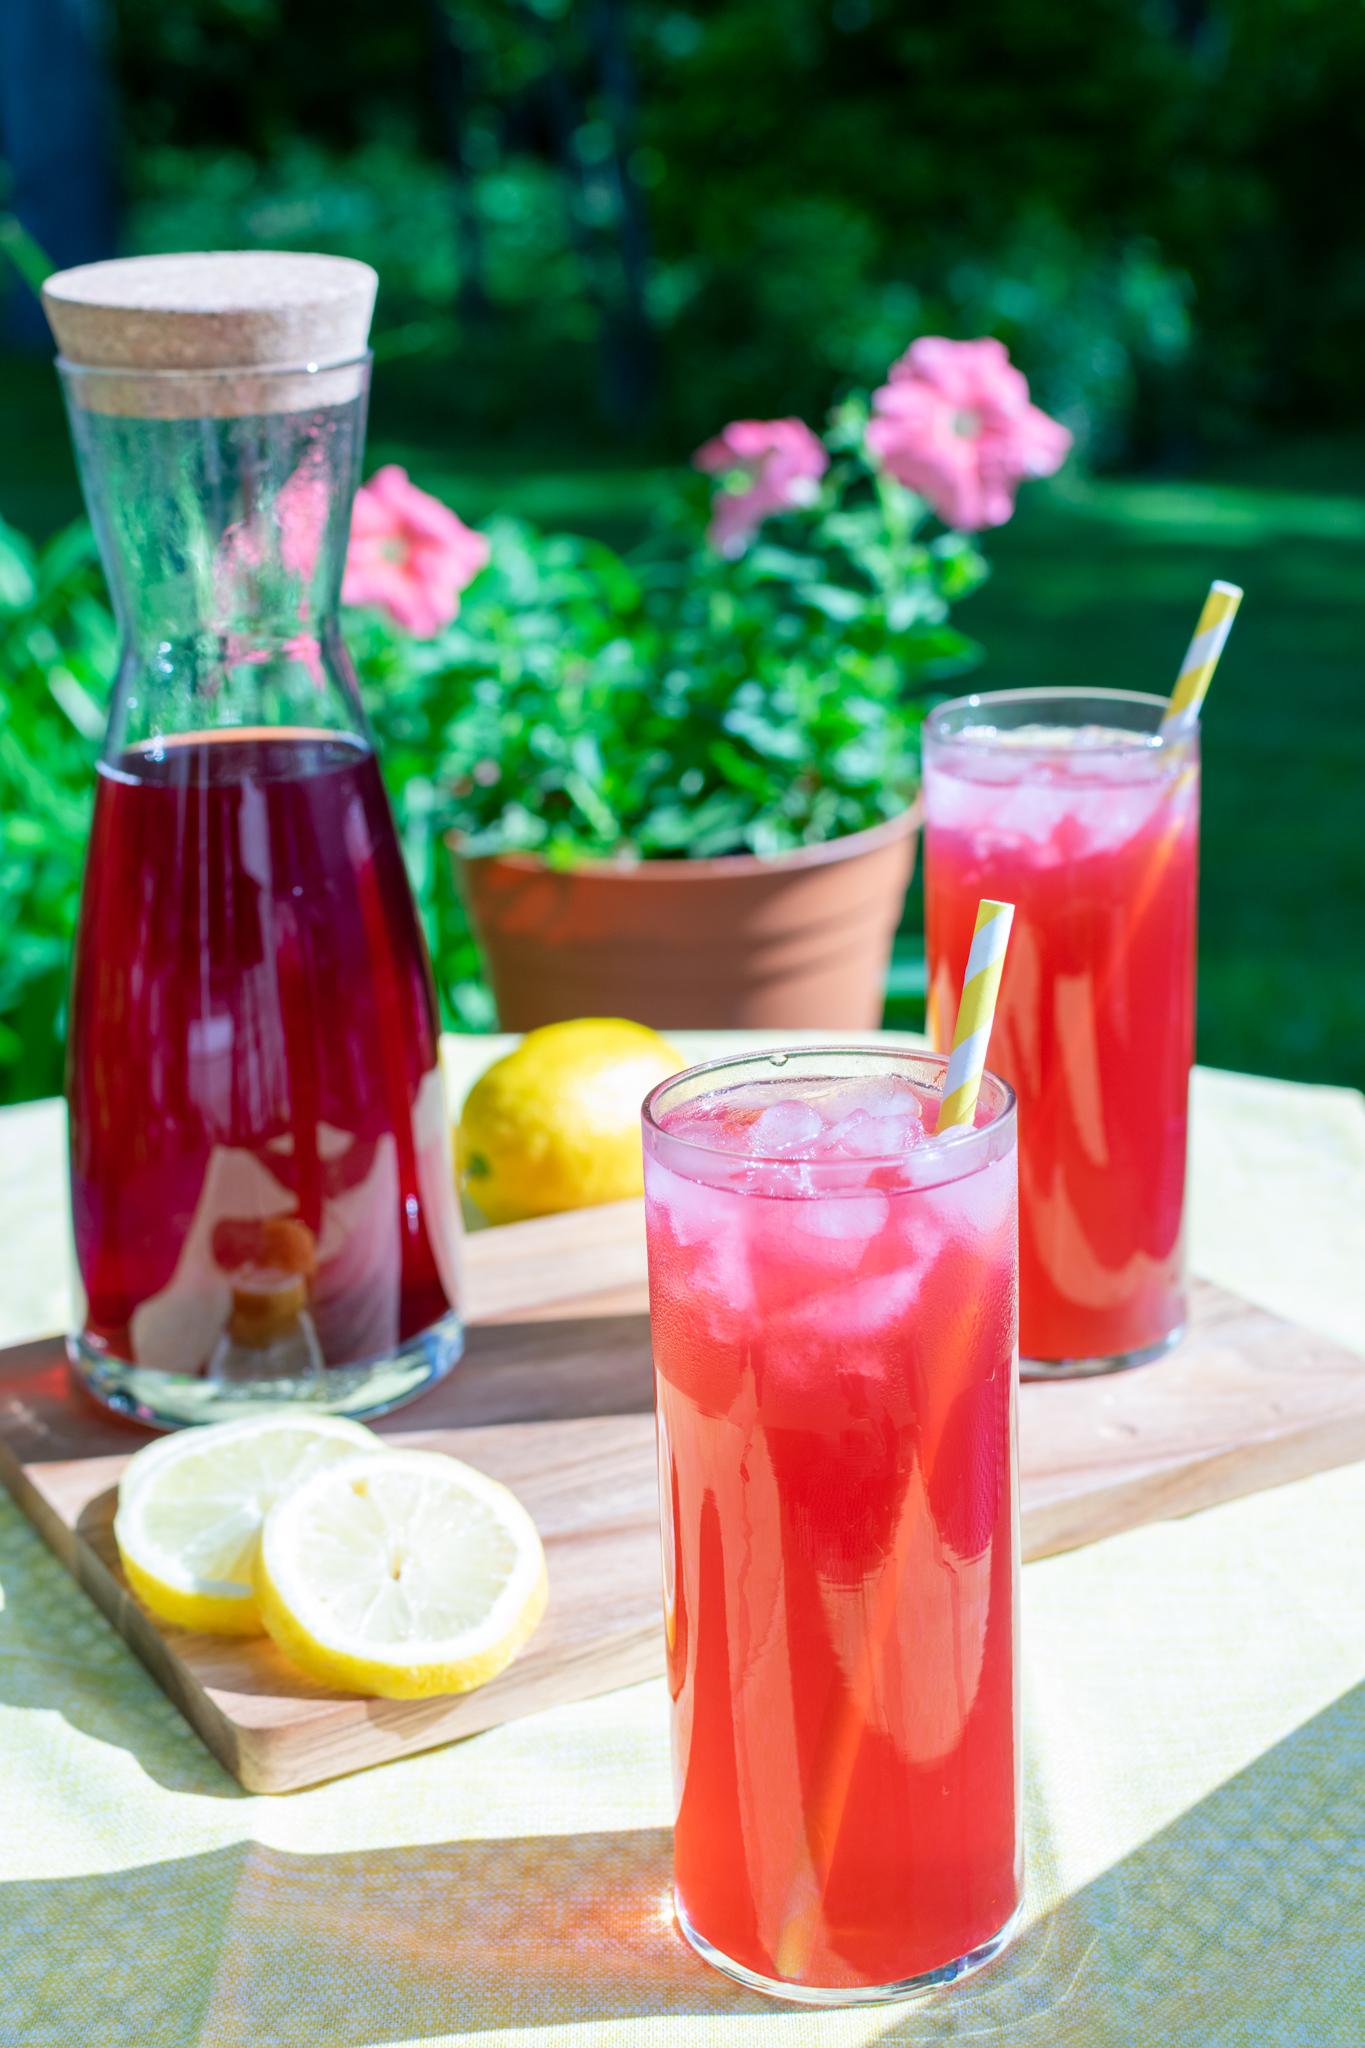 Passion Tango Tea Lemonade Recipe